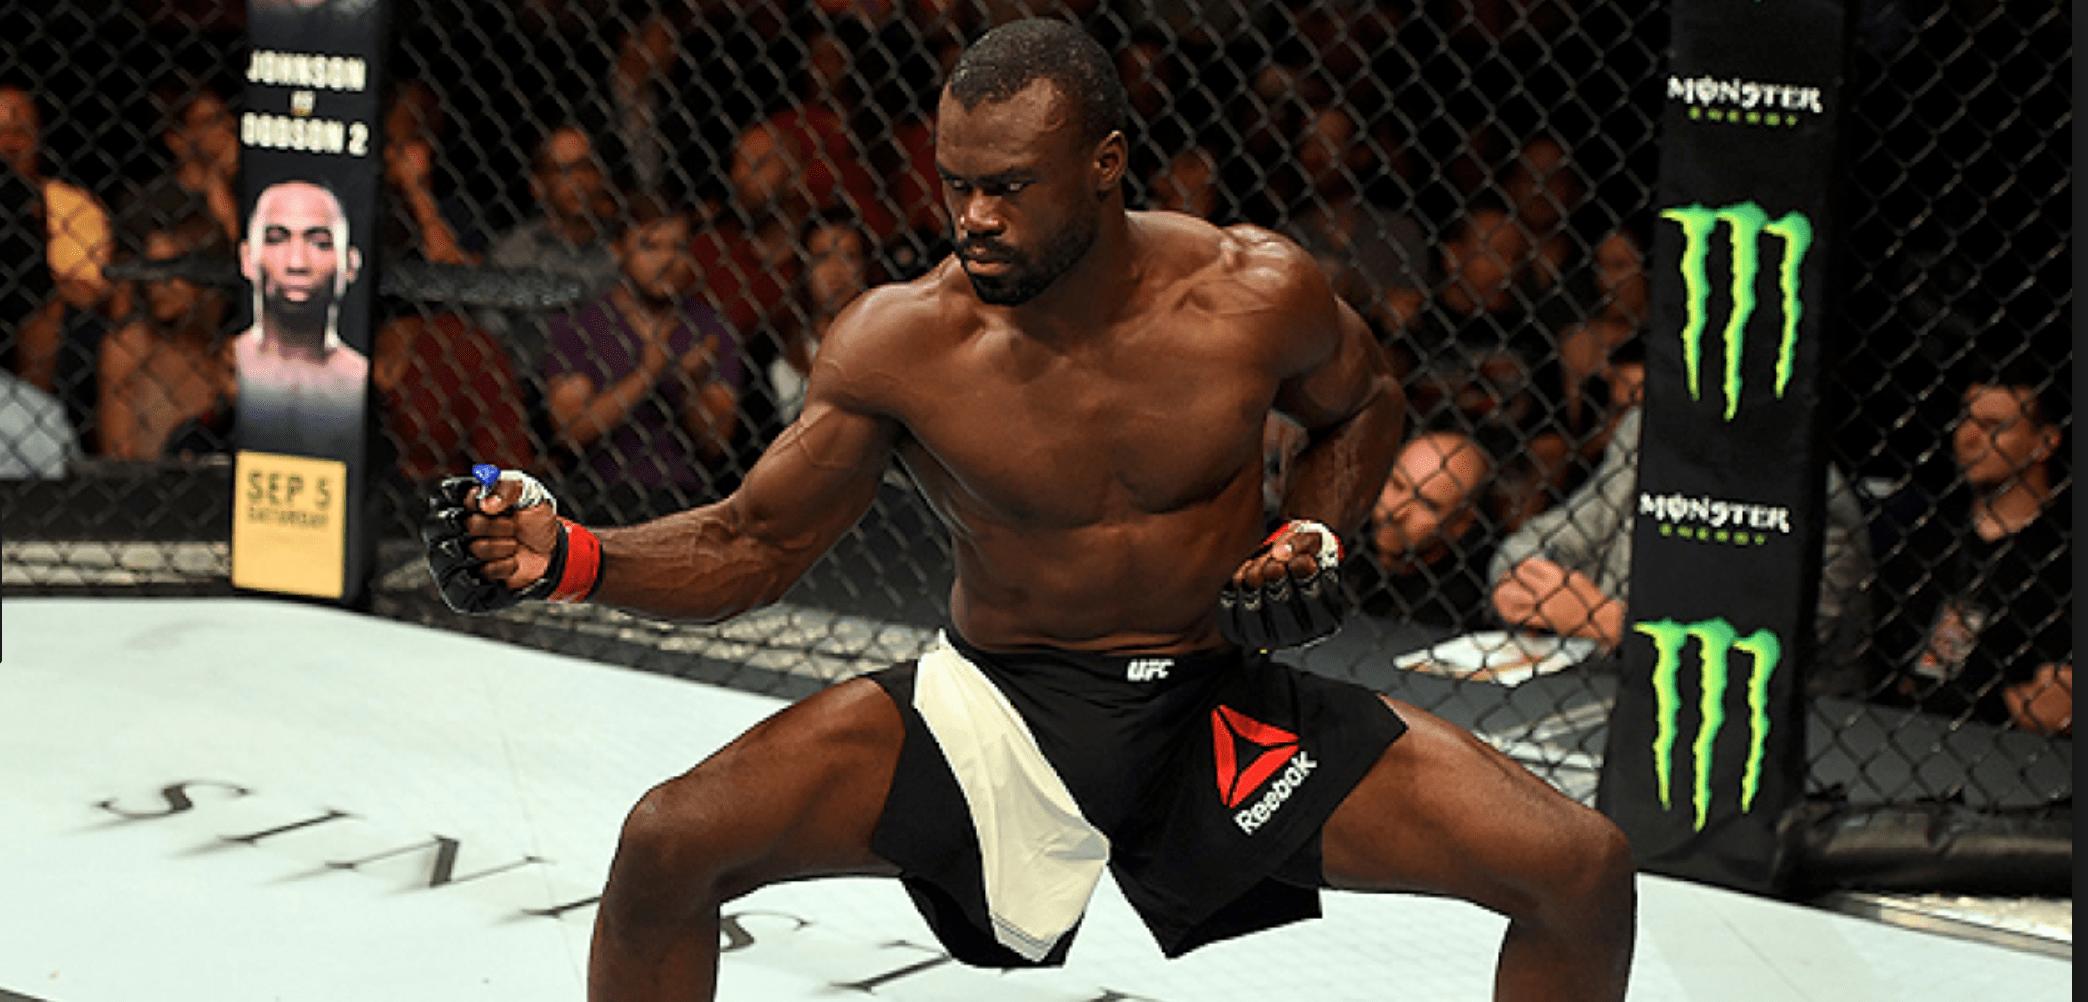 UFC: Uriah Hall Wants To Make A Statement By Finishing Yoel Romero